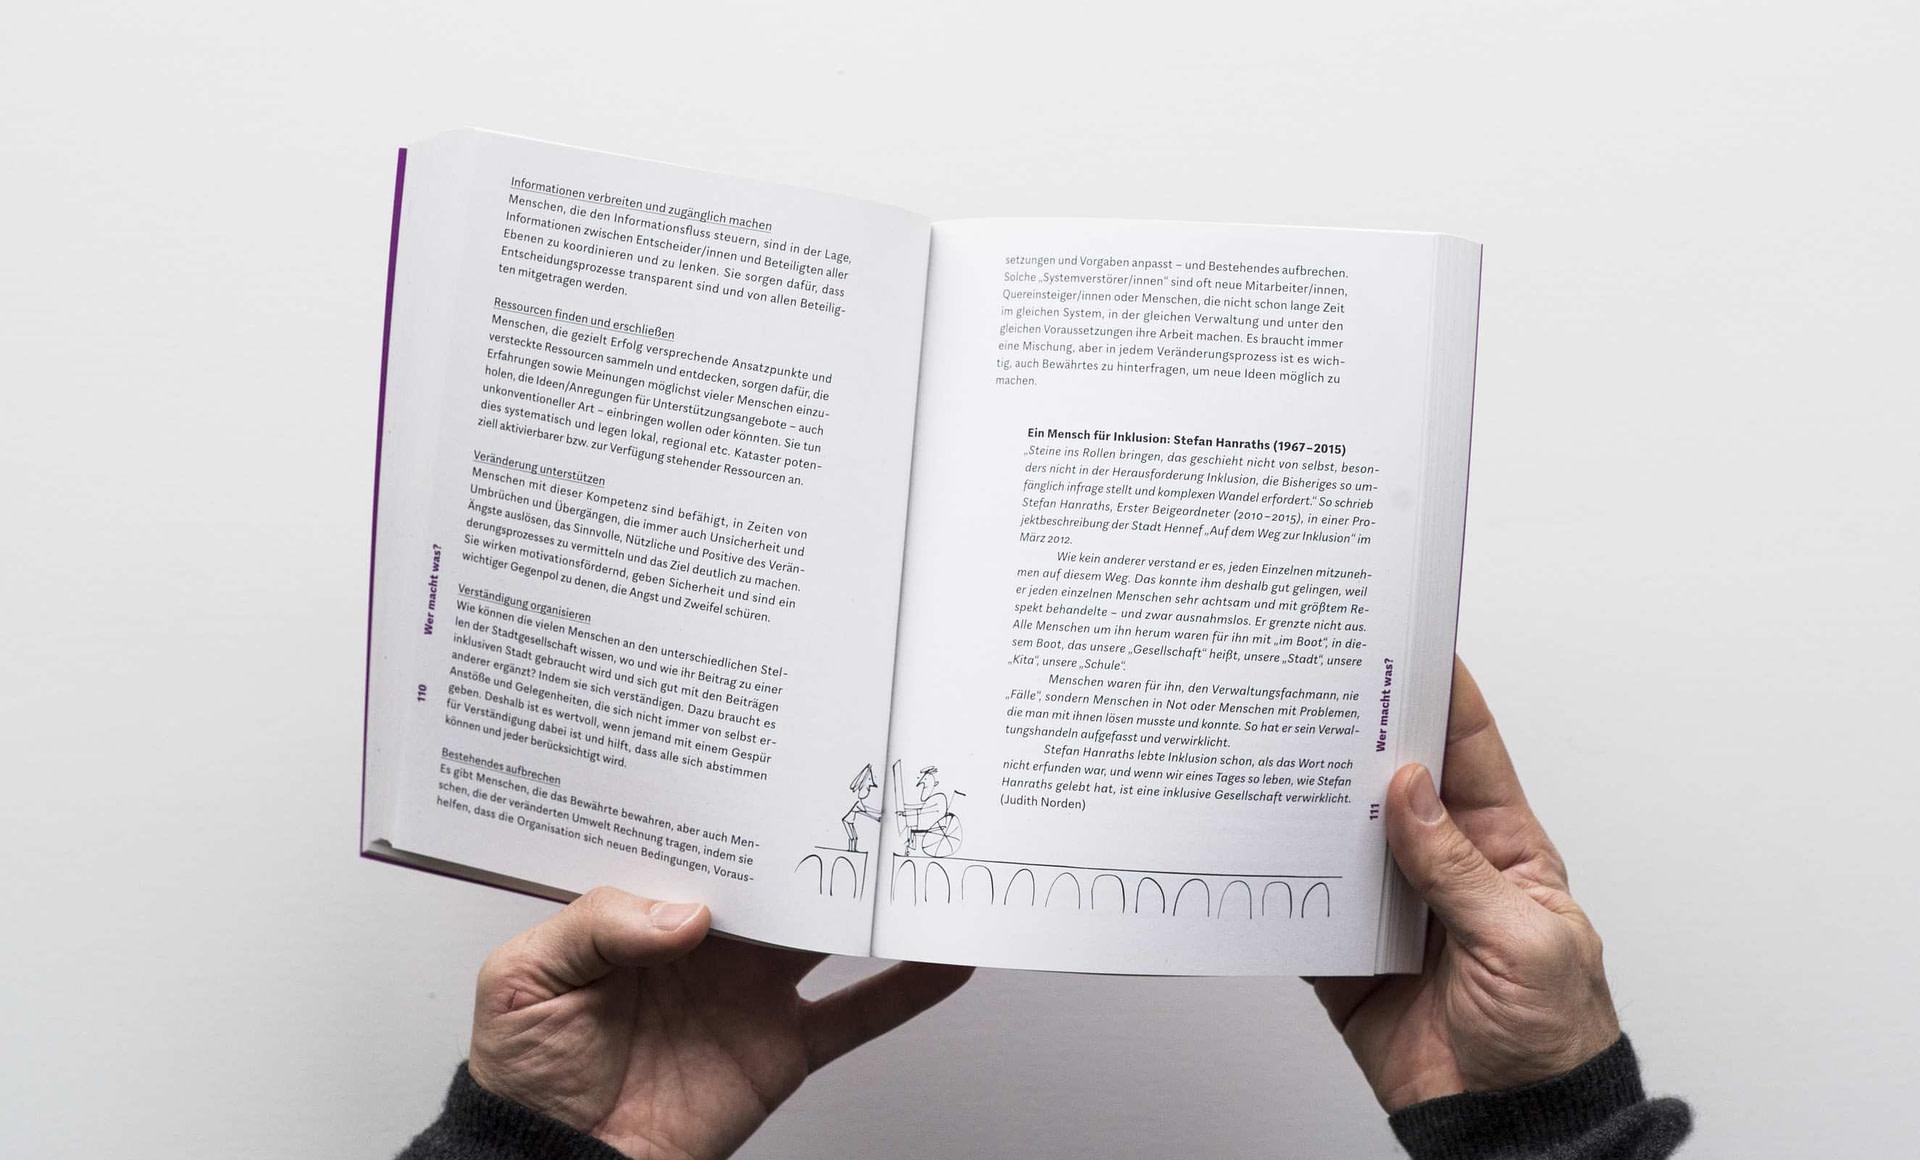 inclusion-fieldbook-14-2650x1600px